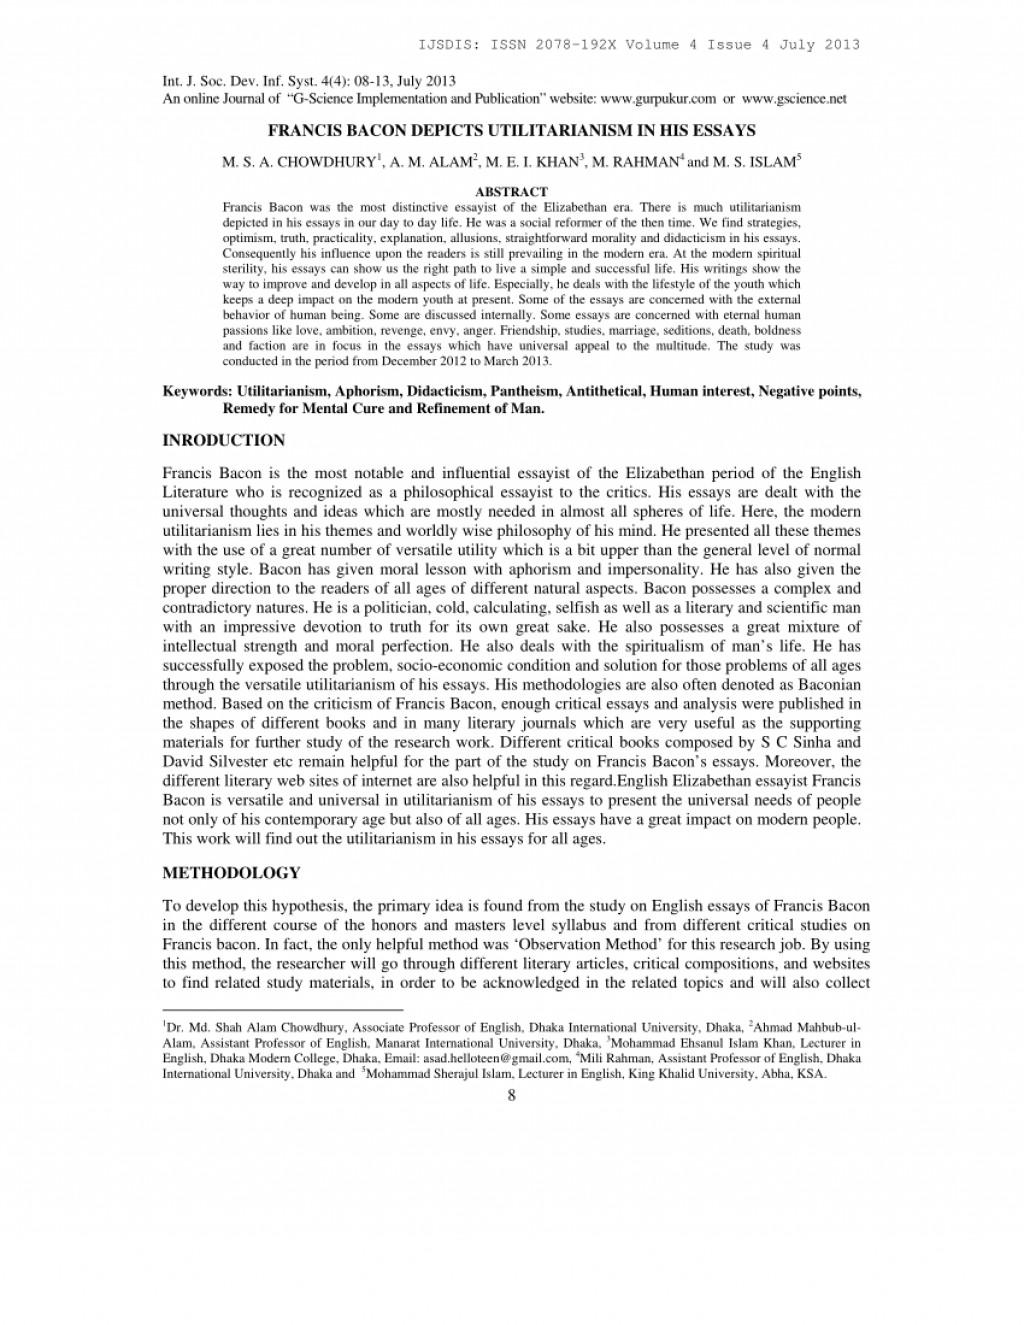 016 Bacons Essays Essay Example Amazing Francis Bacon Google Books Of Truth Quiz Bacon's Summary Large